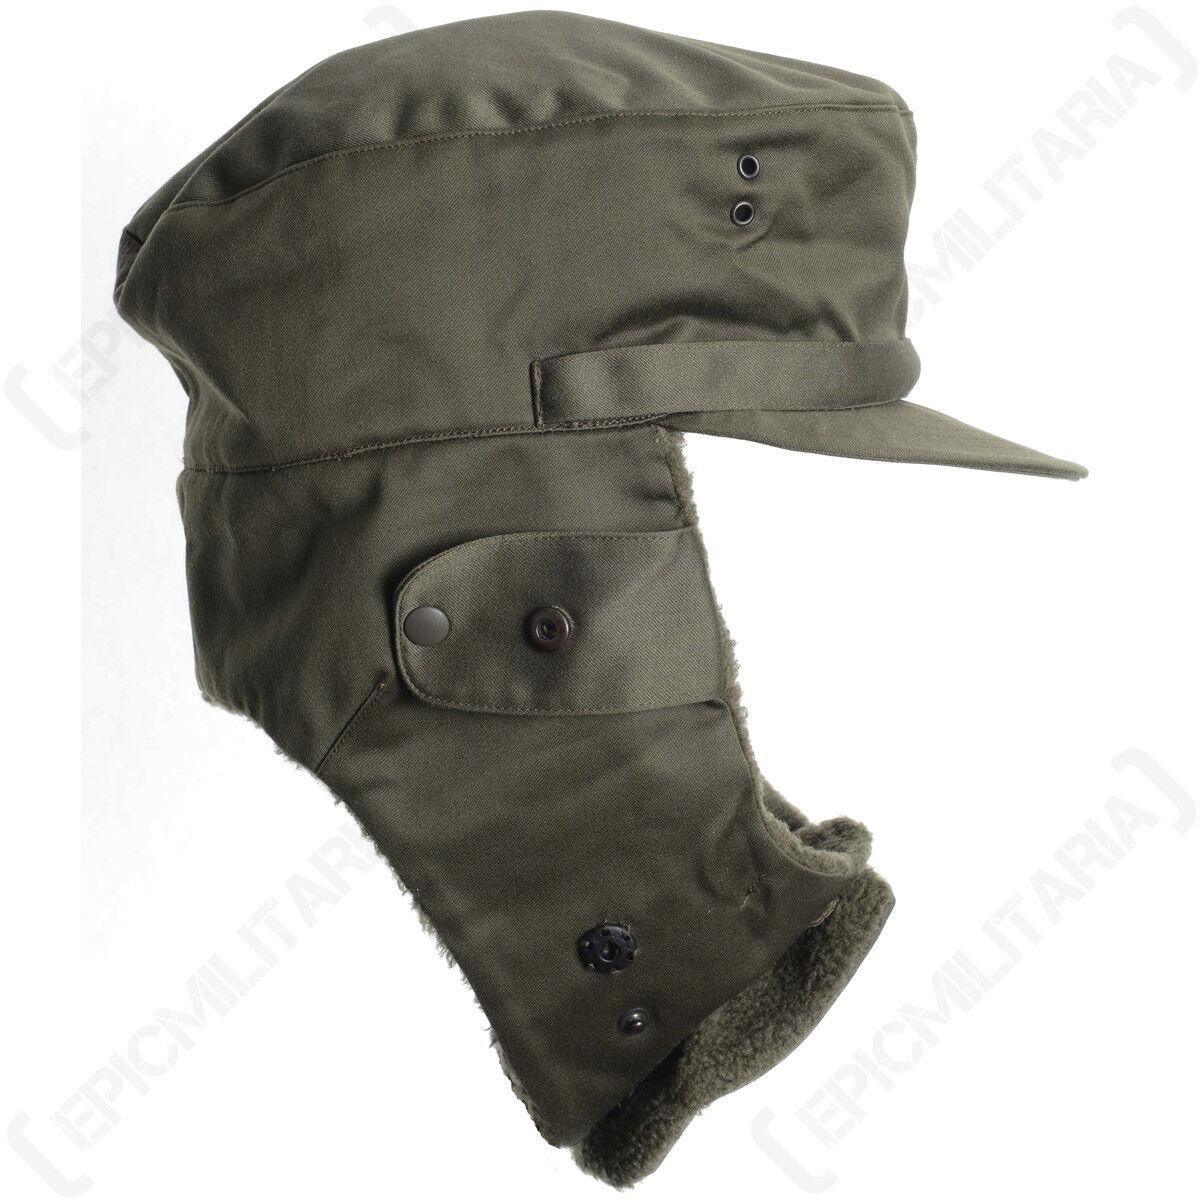 Original Austrian Winter Hat Army Surplus Cap Quilted Fleece Lined Ear Flaps